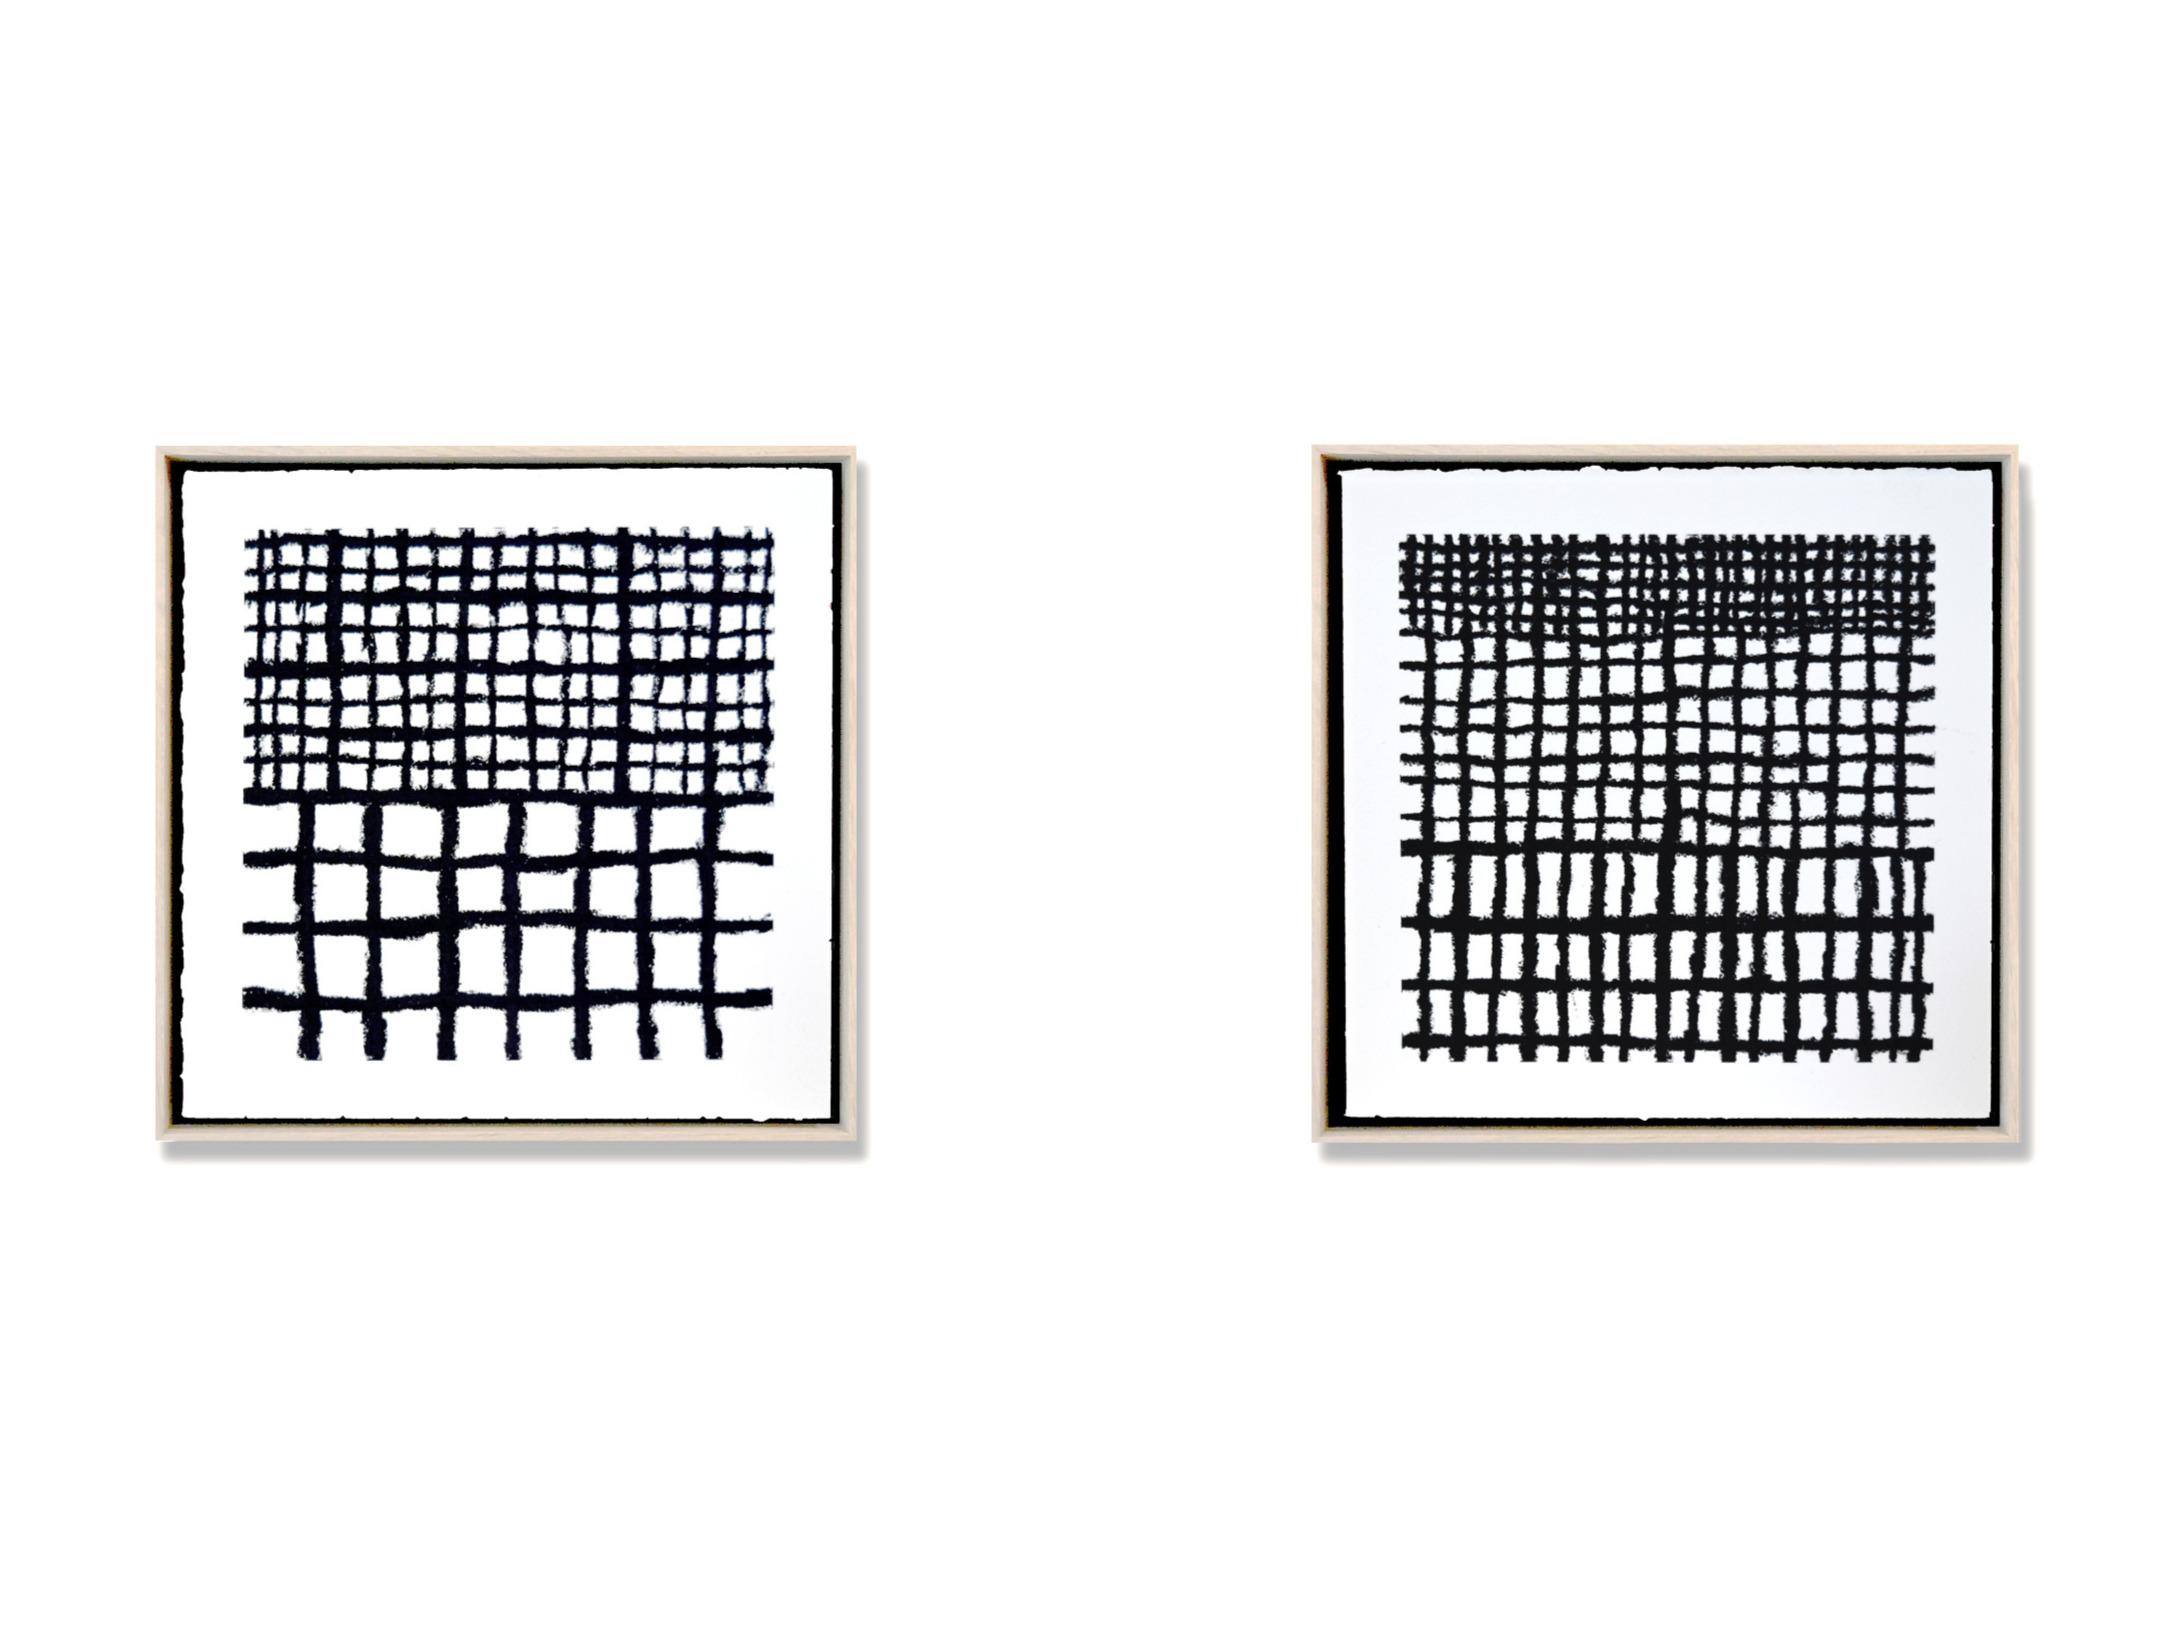 Grids #102218 - #202218